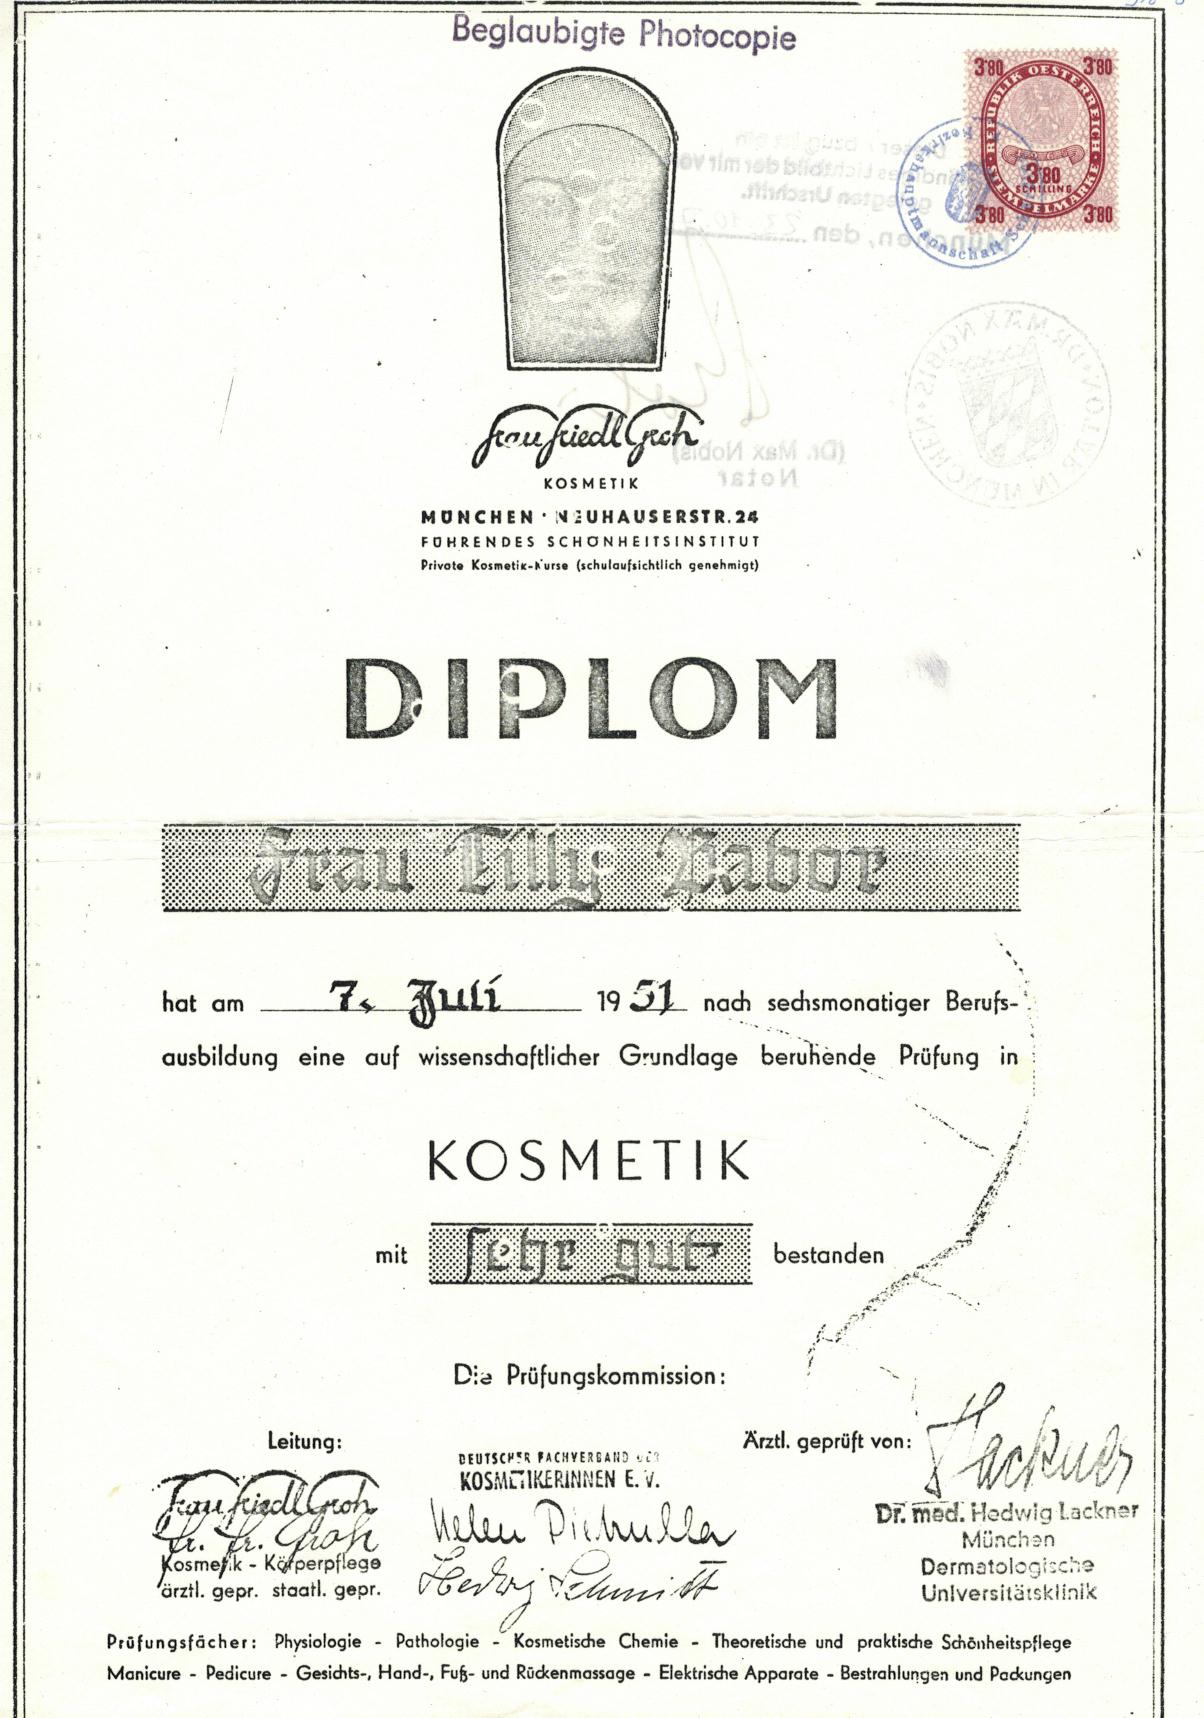 Diplom Tilly Babor 7. Juli 1951